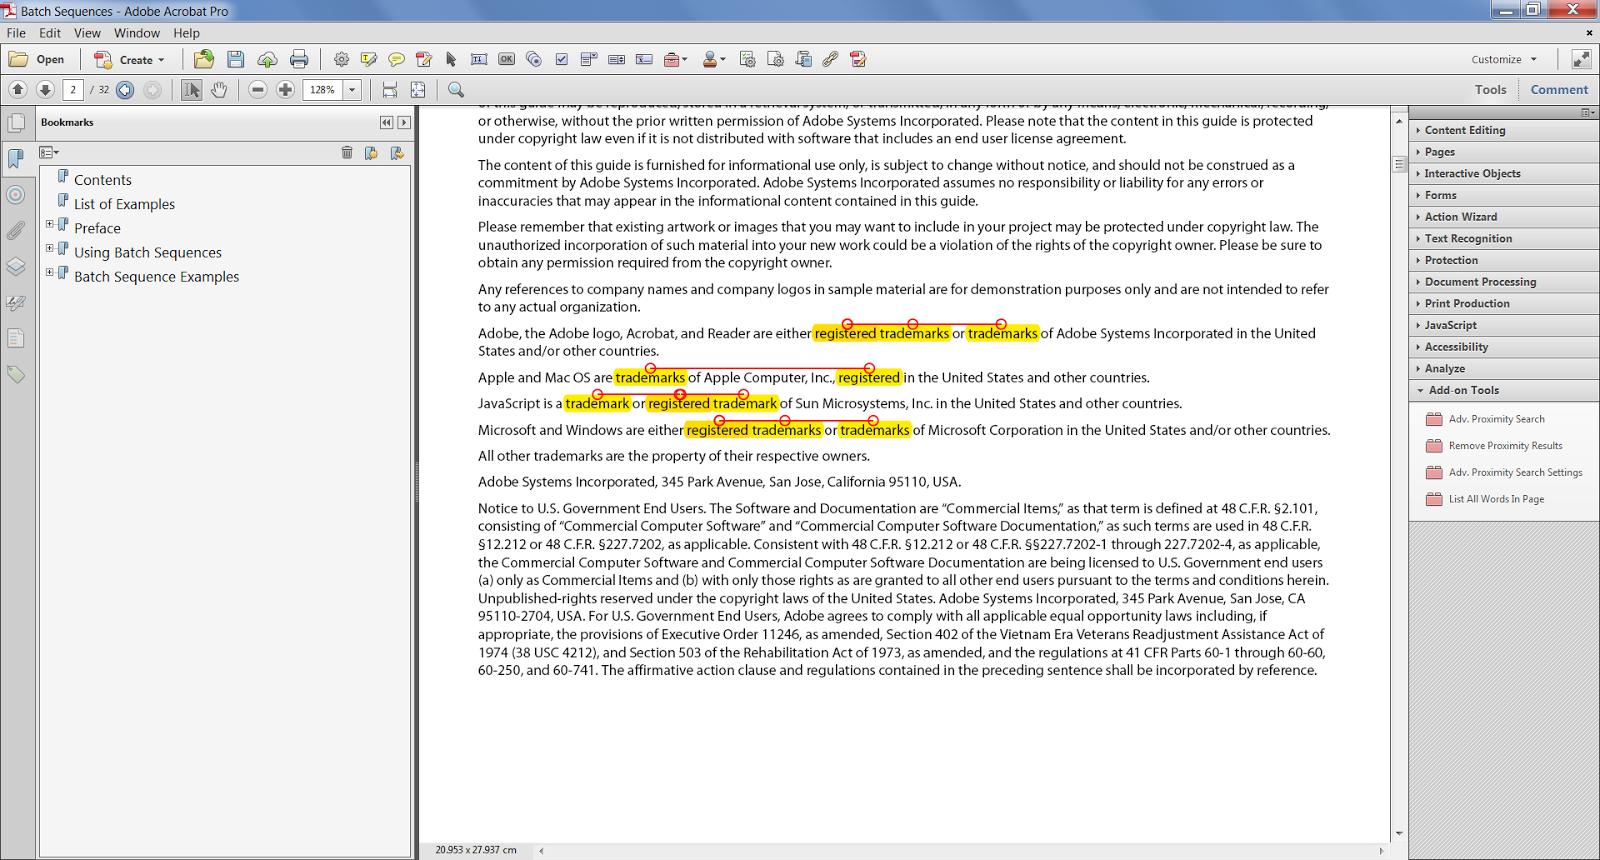 Custom-made Adobe Scripts: Acrobat/Reader - Advanced Proximity Search